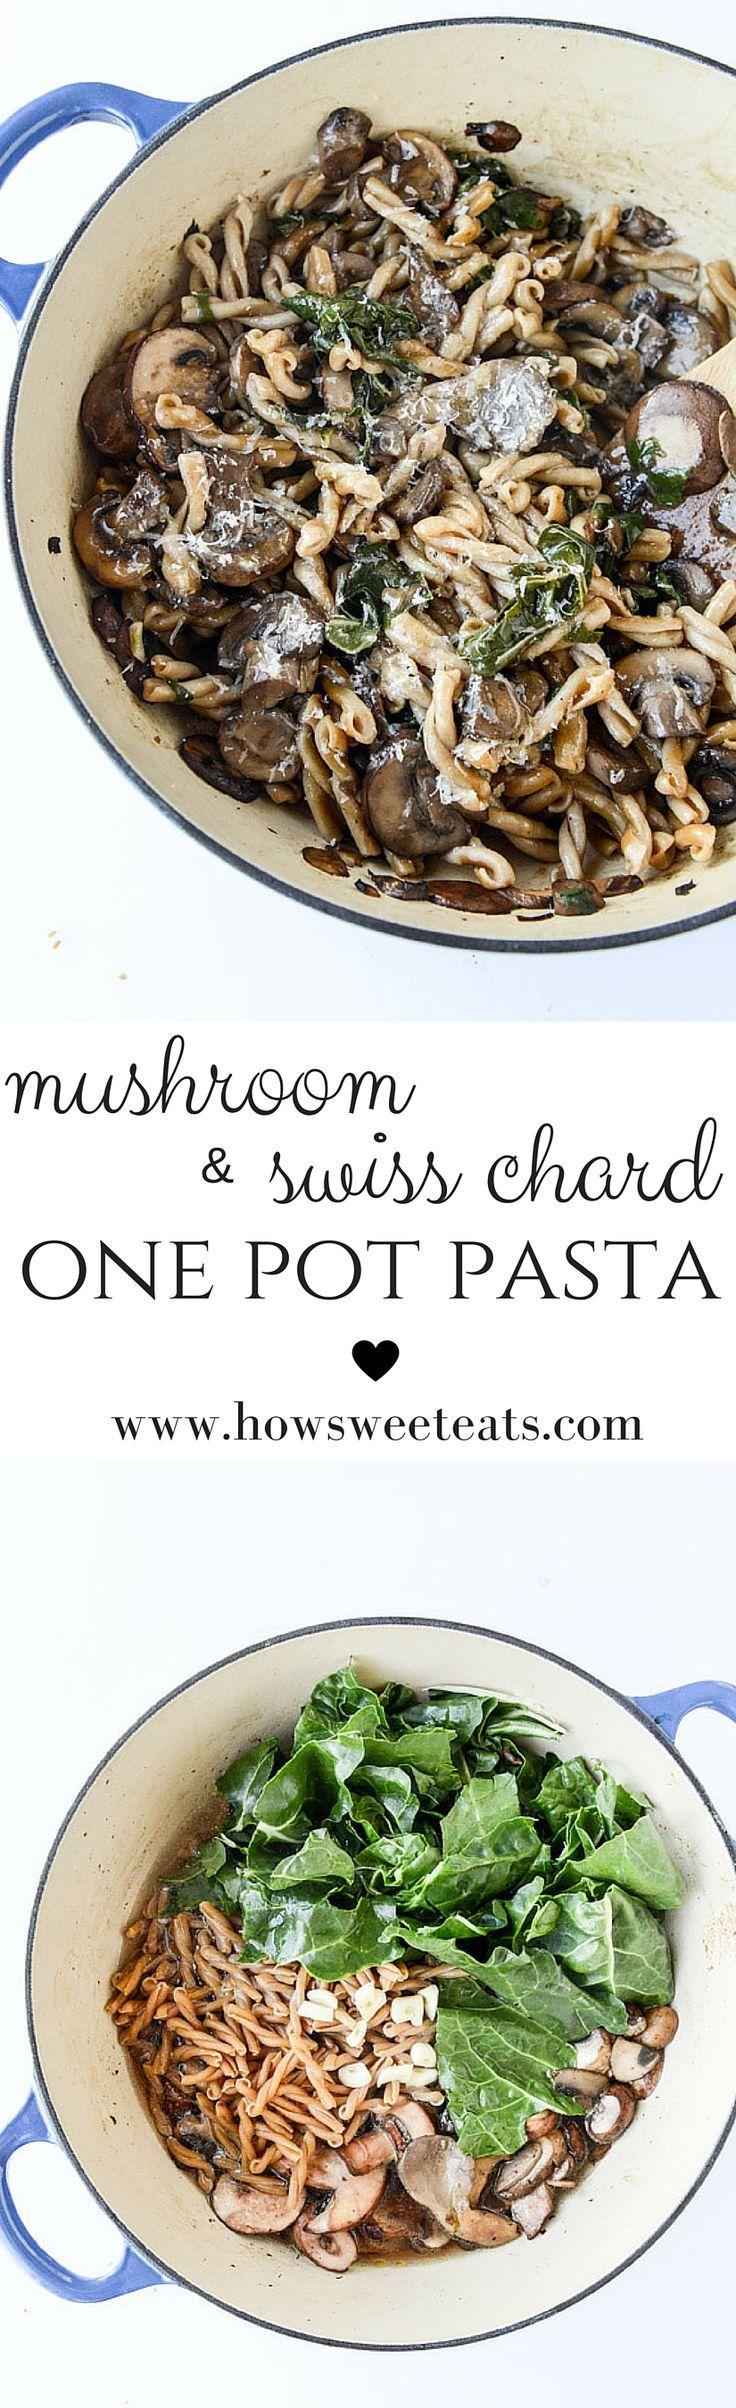 mushroom and swiss chard one pot pasta I http://howsweeteats.com